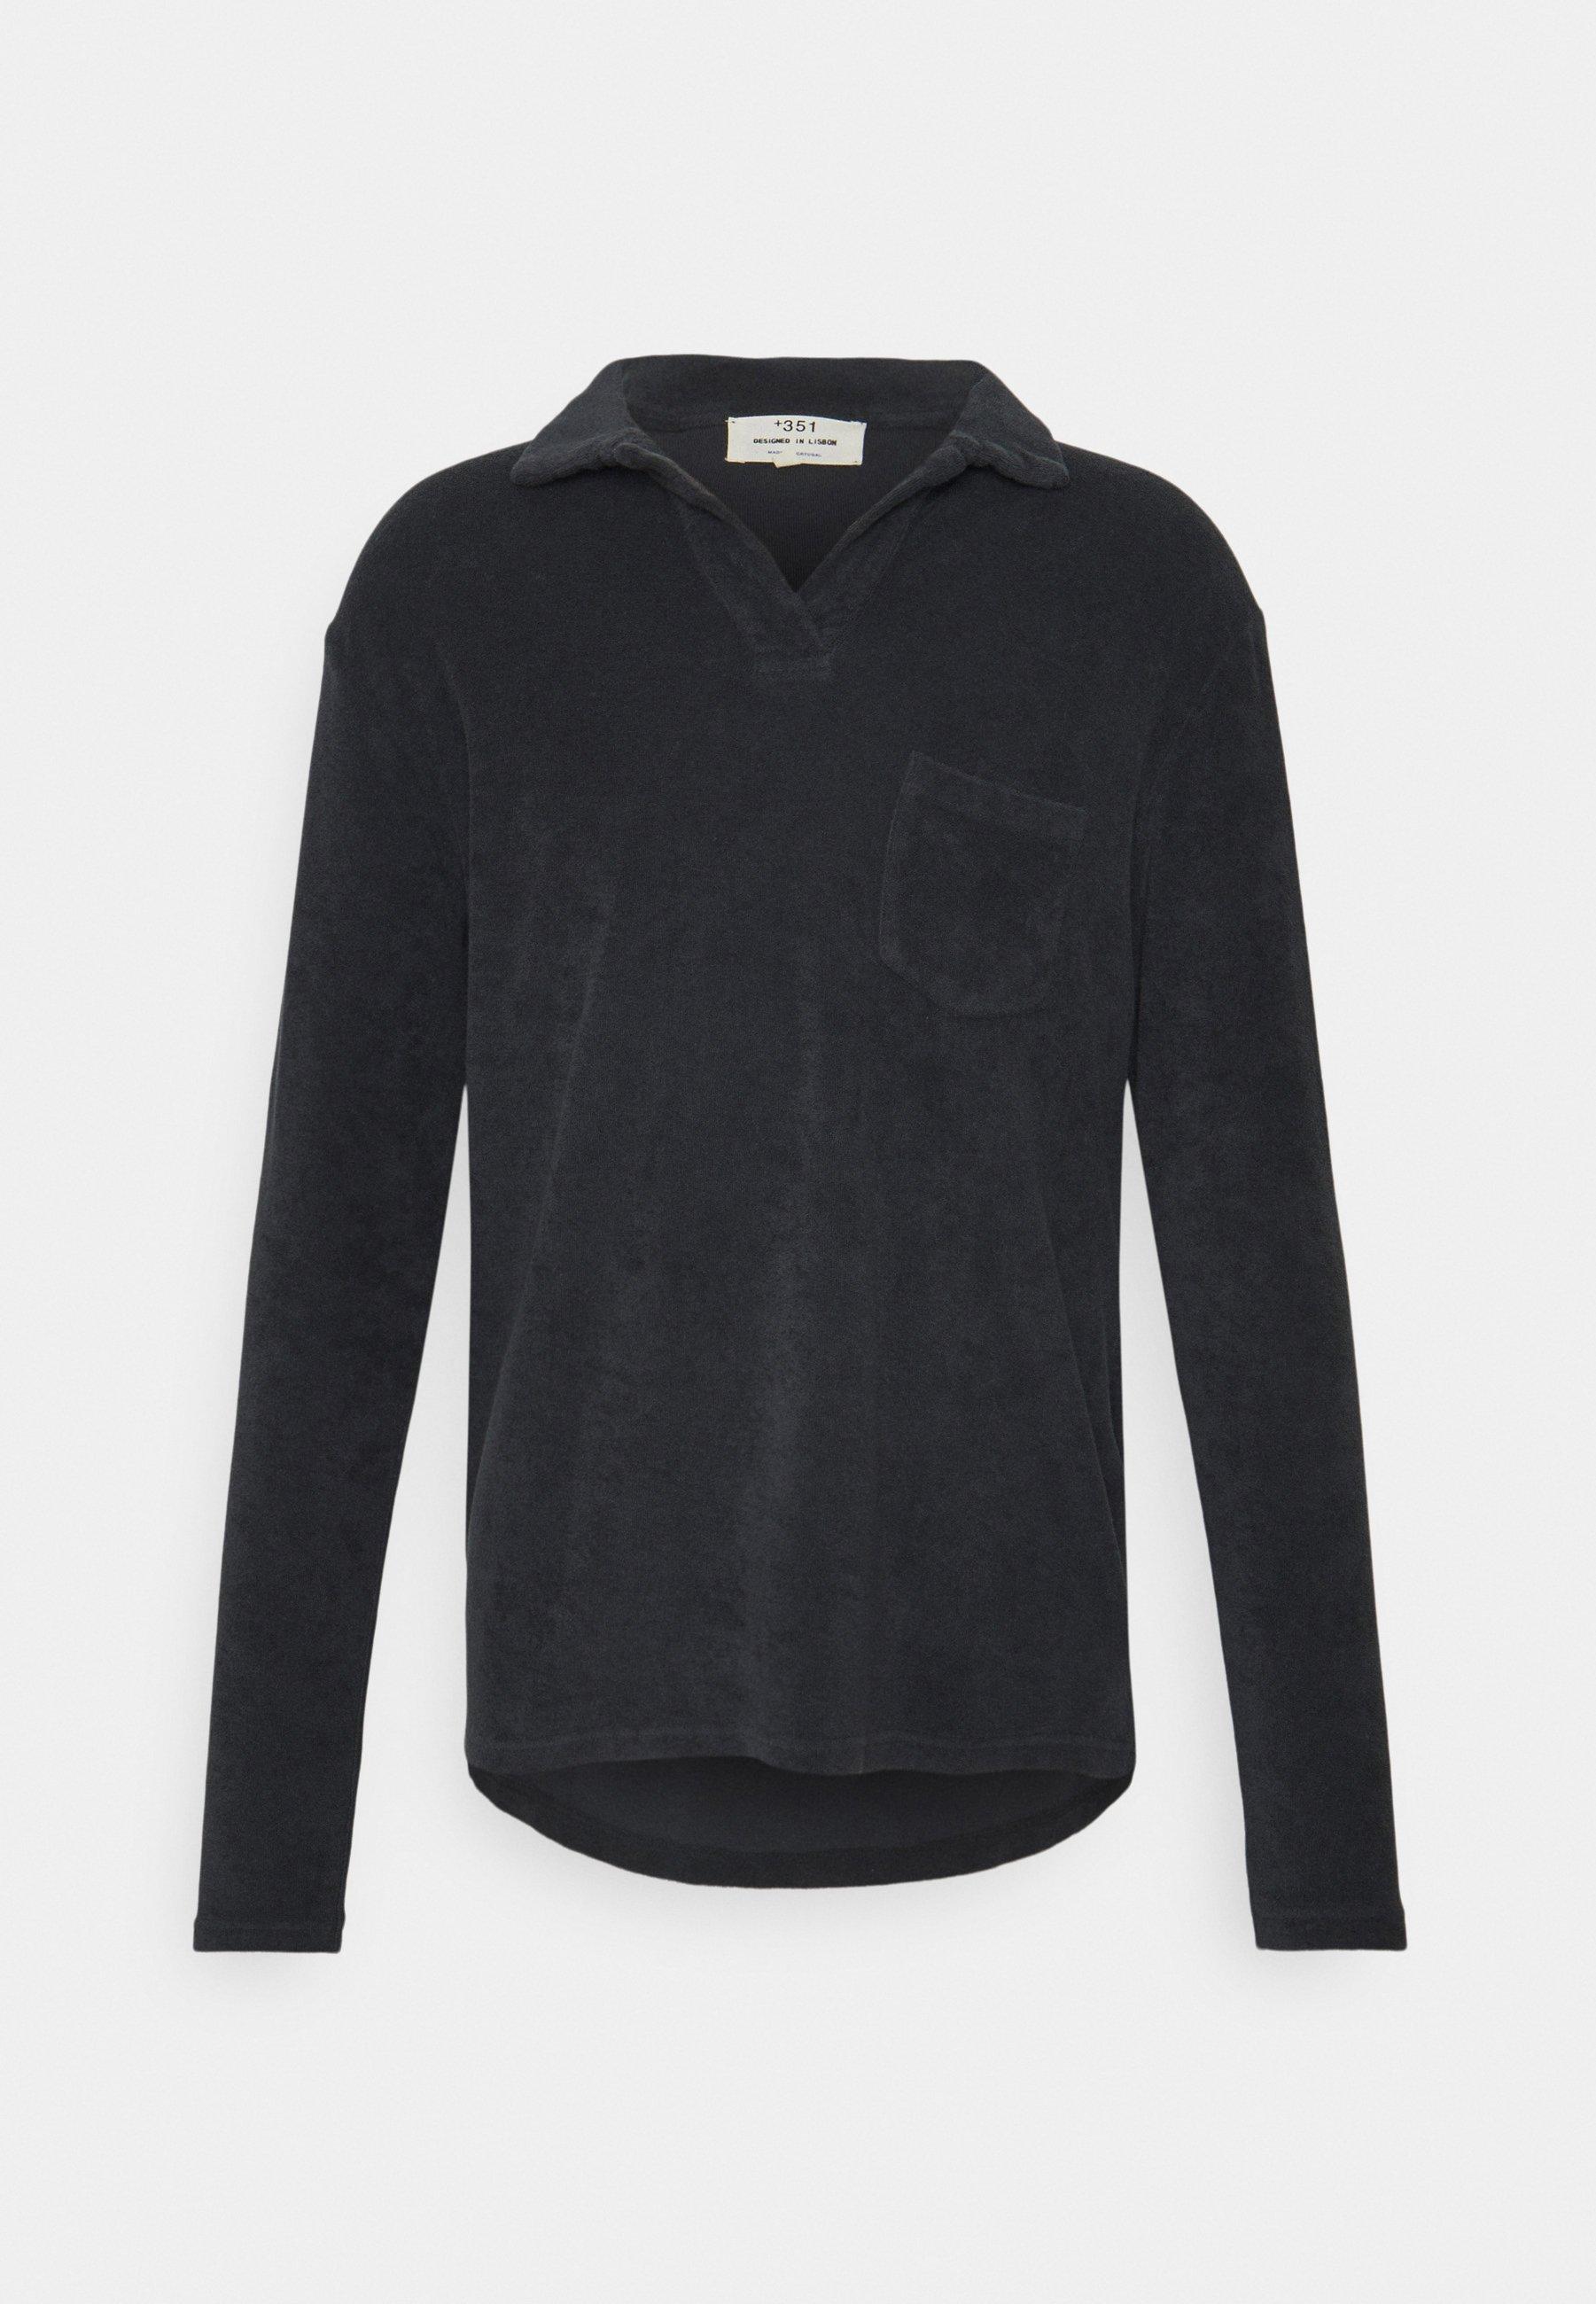 Uomo LONG SLEEVE TERRY UNISEX - Maglietta a manica lunga